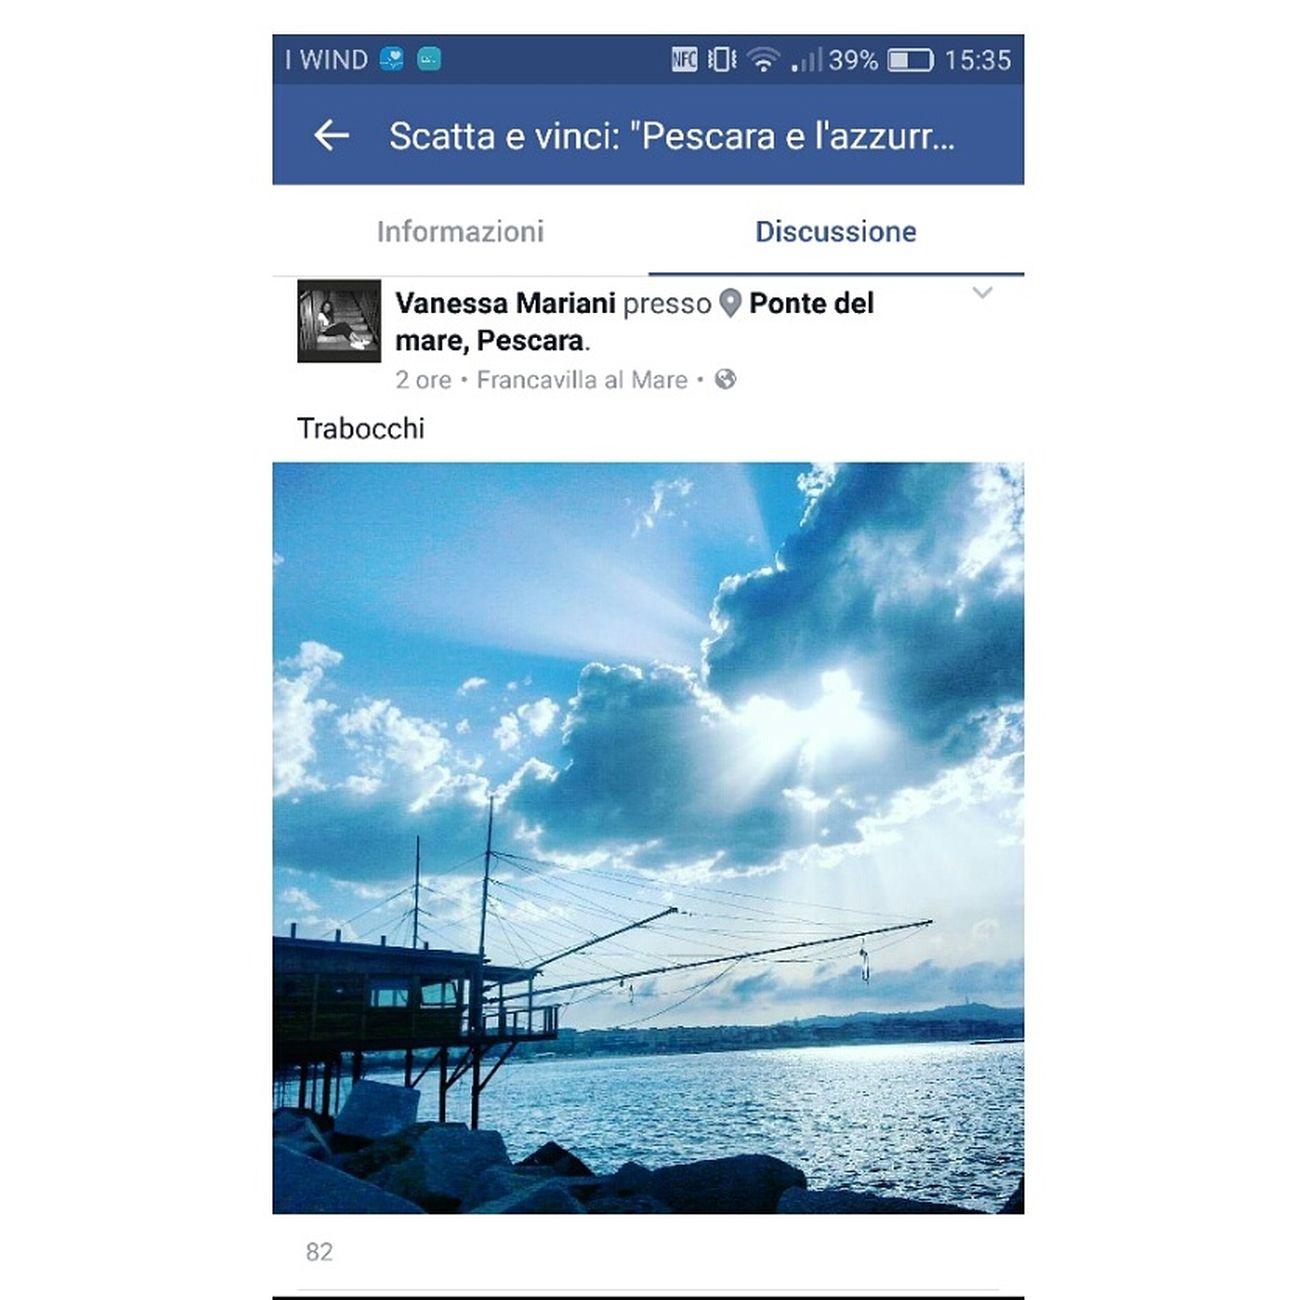 Aprite il link e mettete mi piace... Grazie https://m.facebook.com/events/1780364165510007?view=permalink&id=1782490601964030 Taking Photos Enjoying Life Calor Mare Abruzzo Enjoying Life Mare Nostrum Sun HuaweiP9 Dual Lens Leica Lens Luce Light Pescara Pescaracity Pescara,summer,sun,beach,sea,sunrise Volgoitalia Volgopescara Ig_pescara